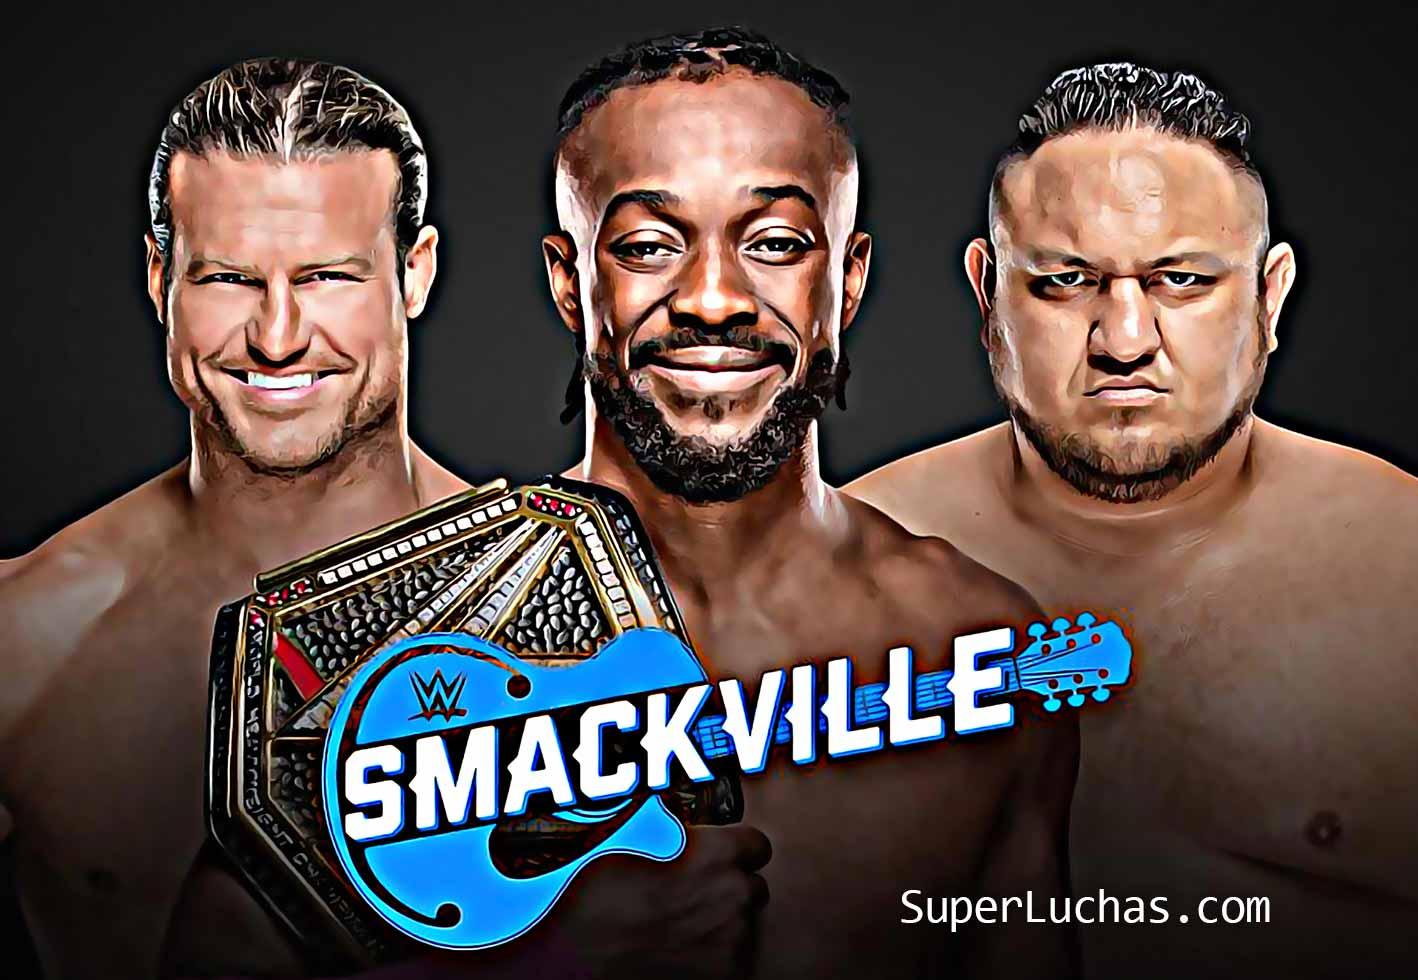 WWE Smack Ville 2019